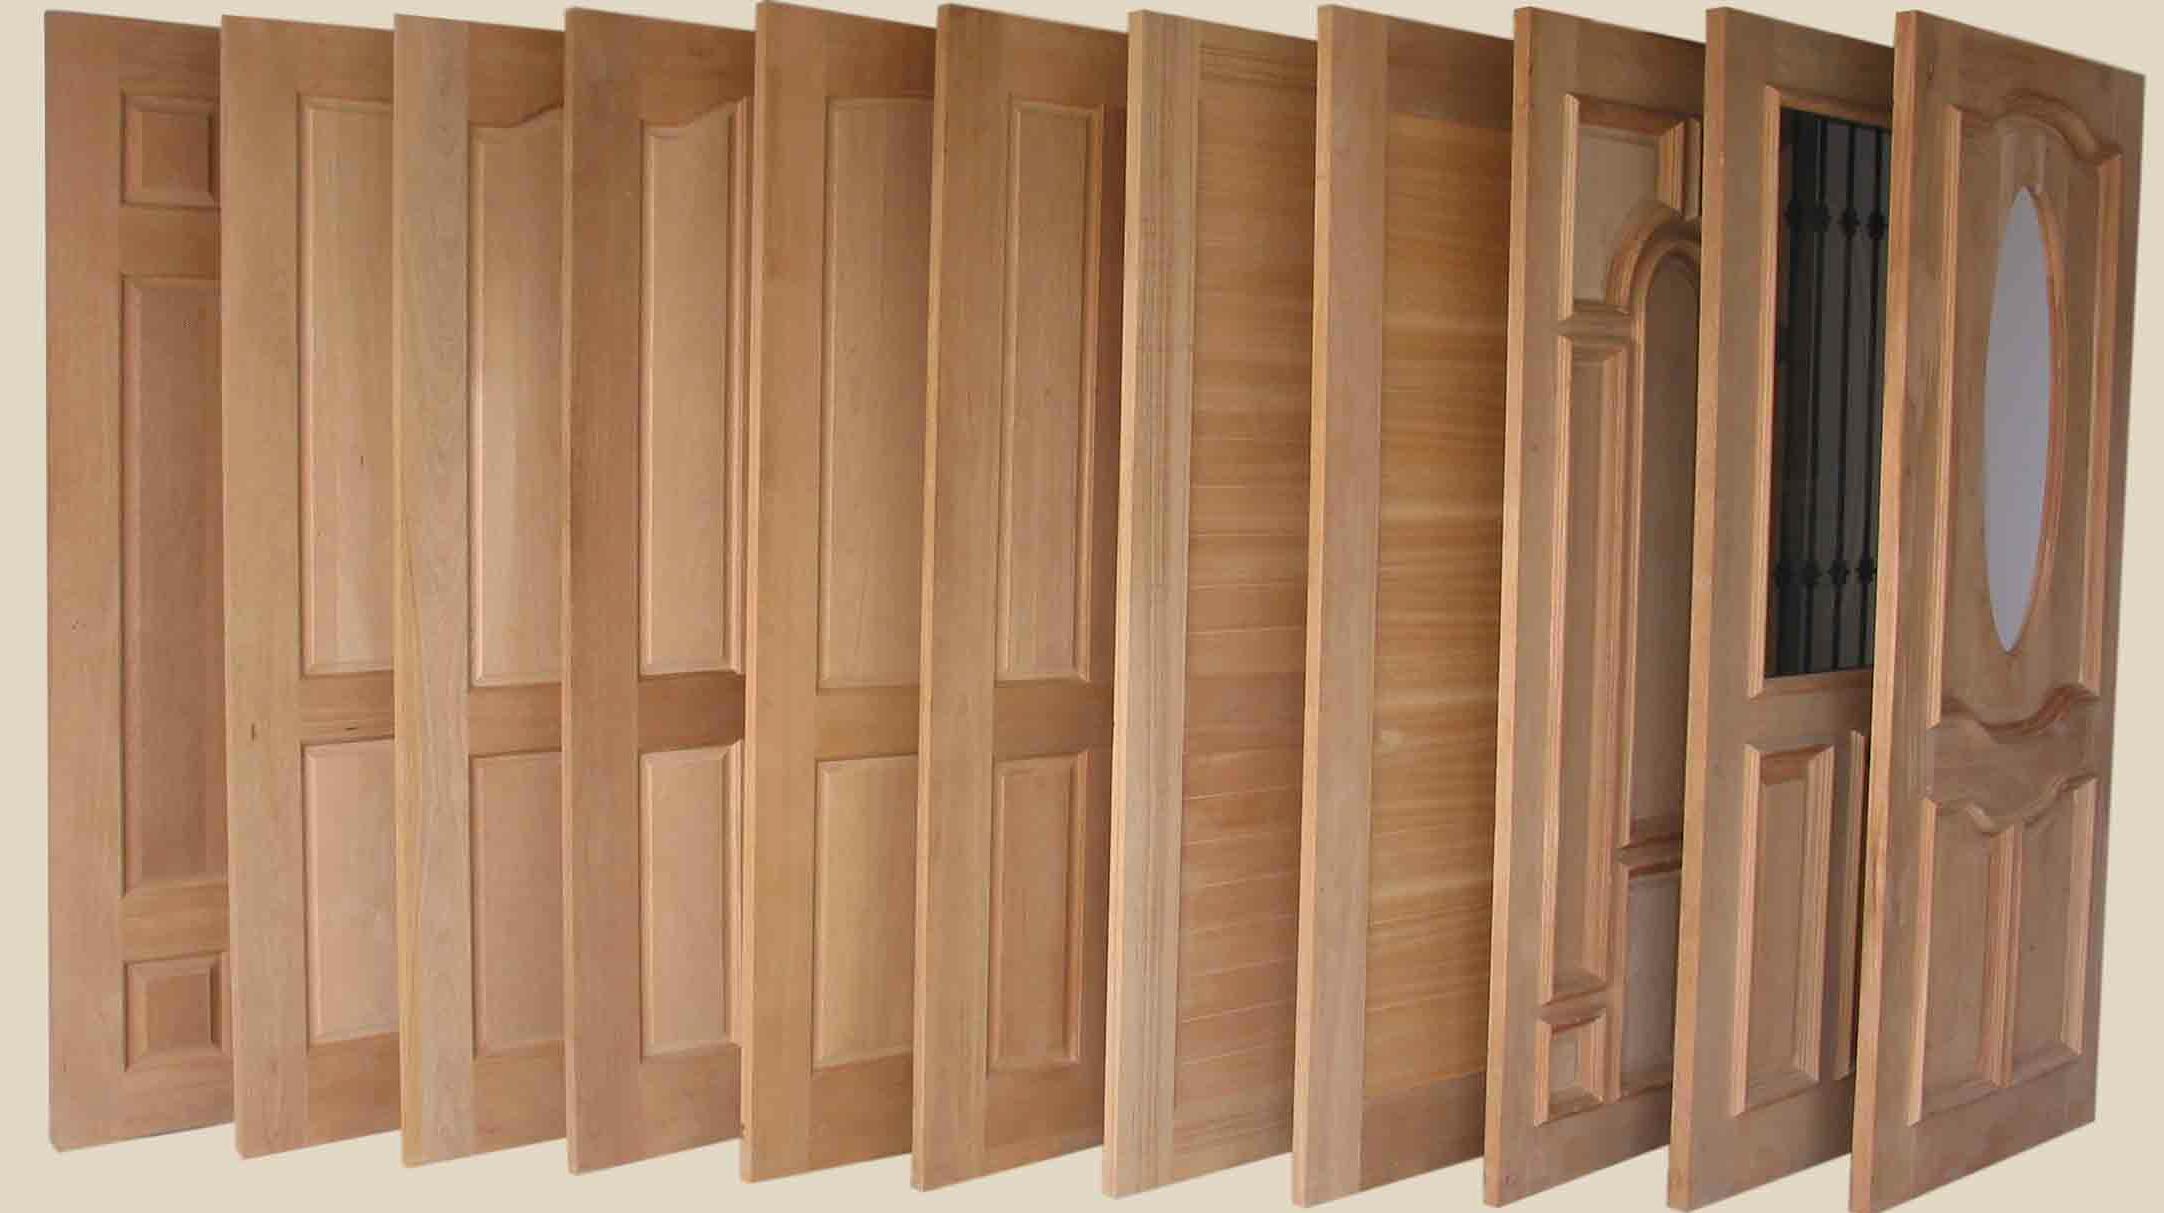 Puertas de madera exterior auto design tech for Puertas de madera interiores